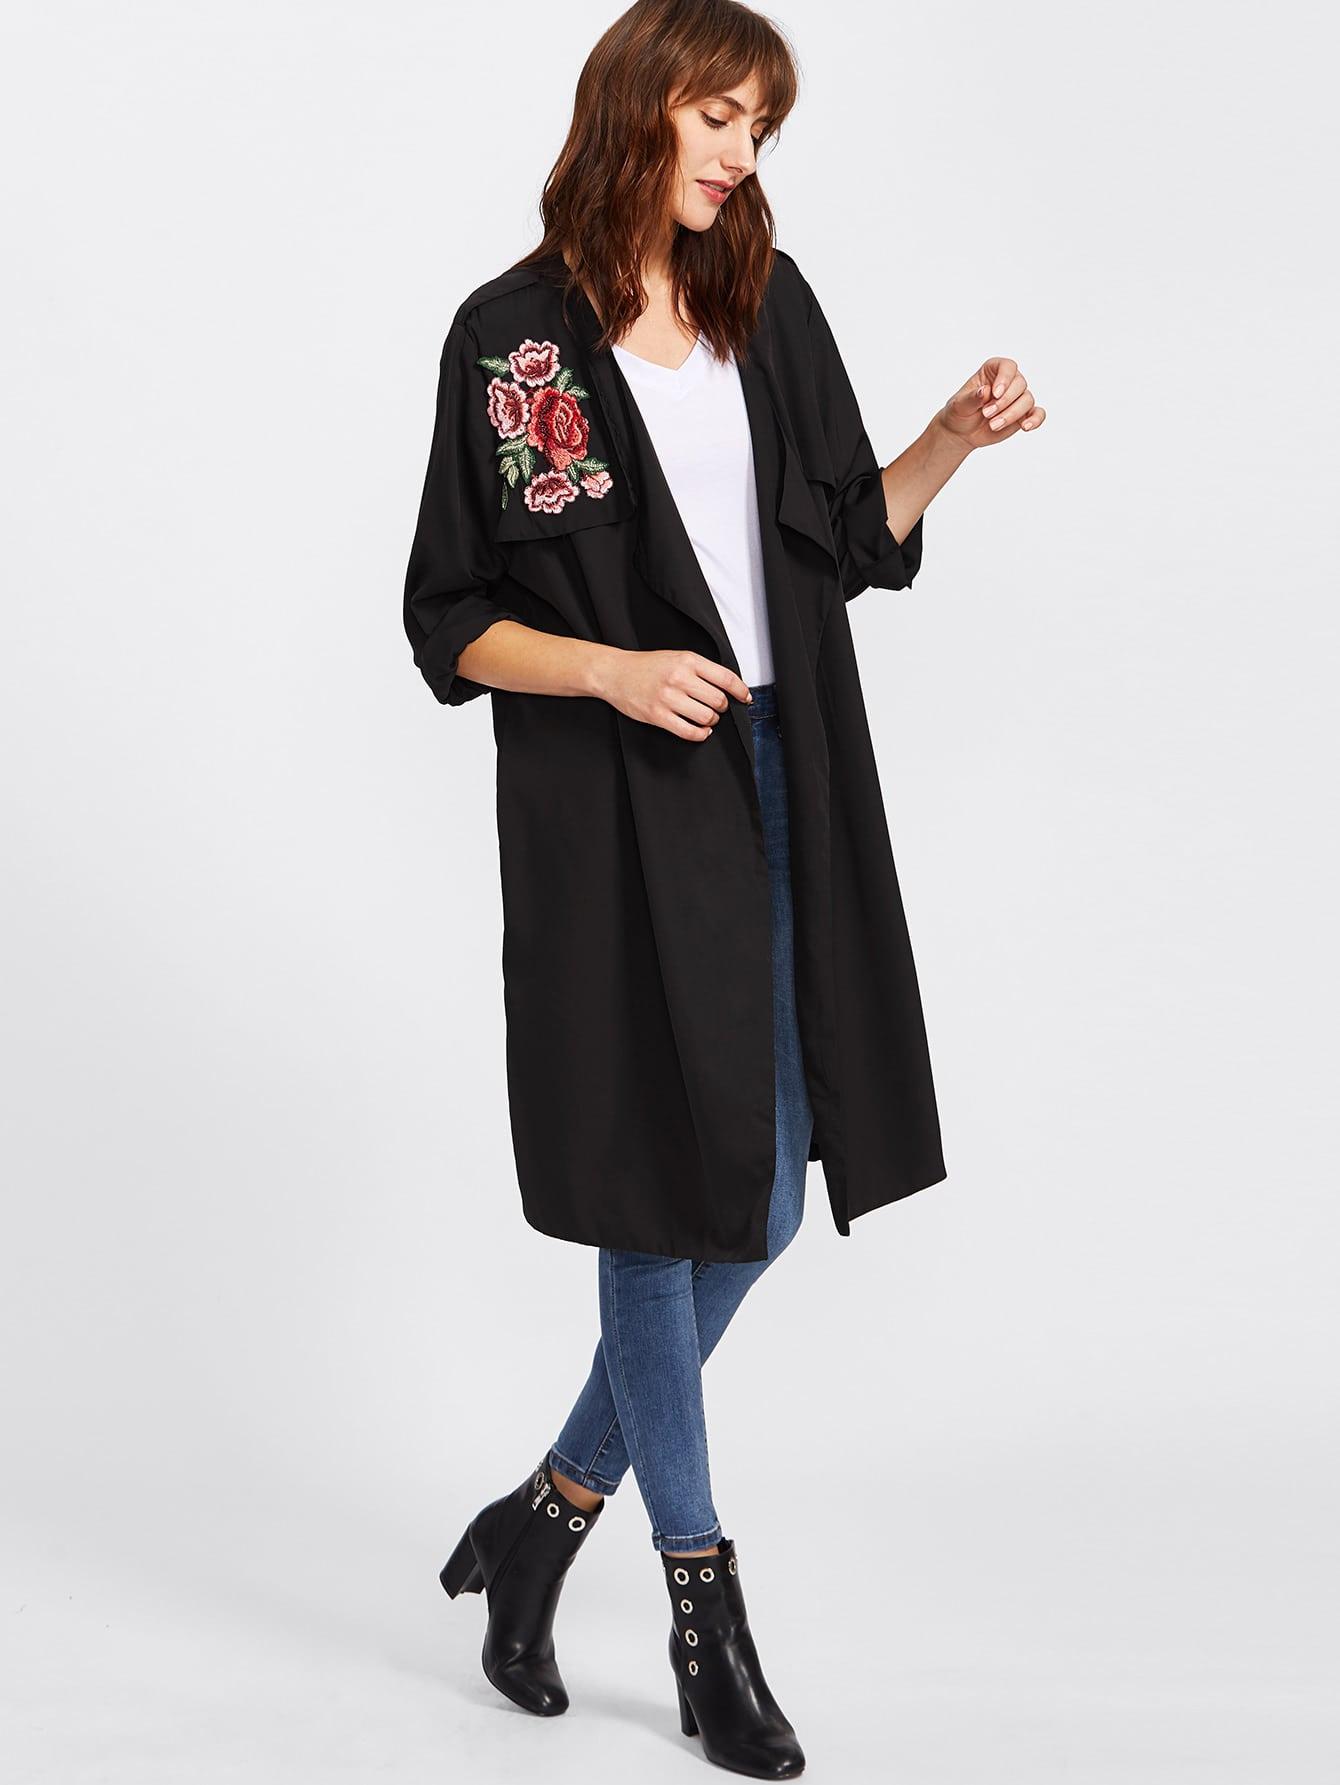 Embroidered Rose Applique Longline Cardigan Coat -SheIn(Sheinside)